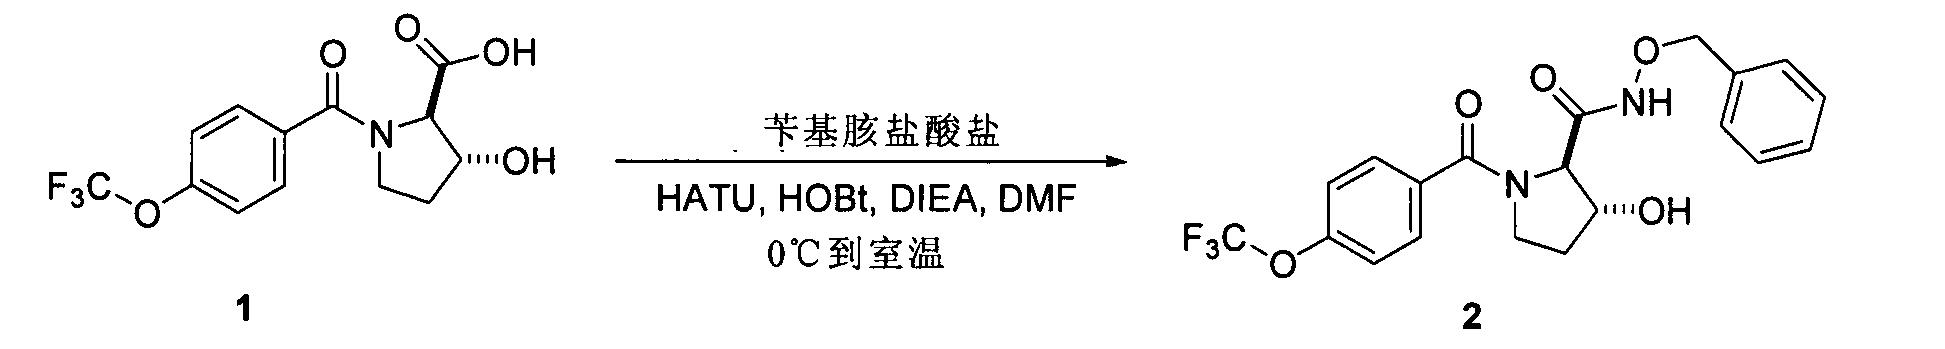 Figure CN102267924AD00622